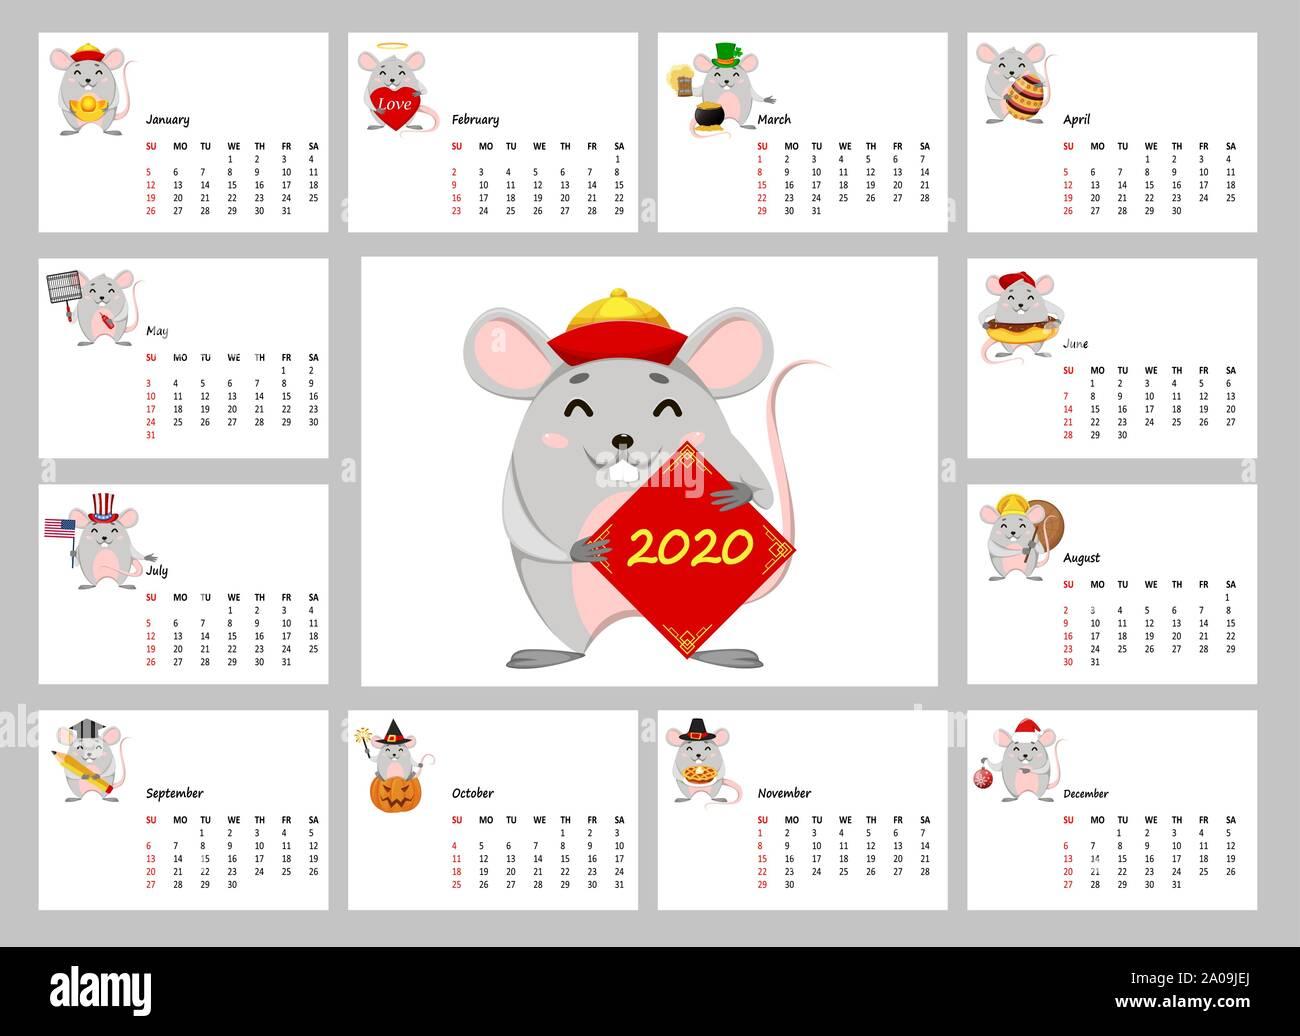 Chinese Lunar Calendar 2020 💣 Chinese New Year 2020